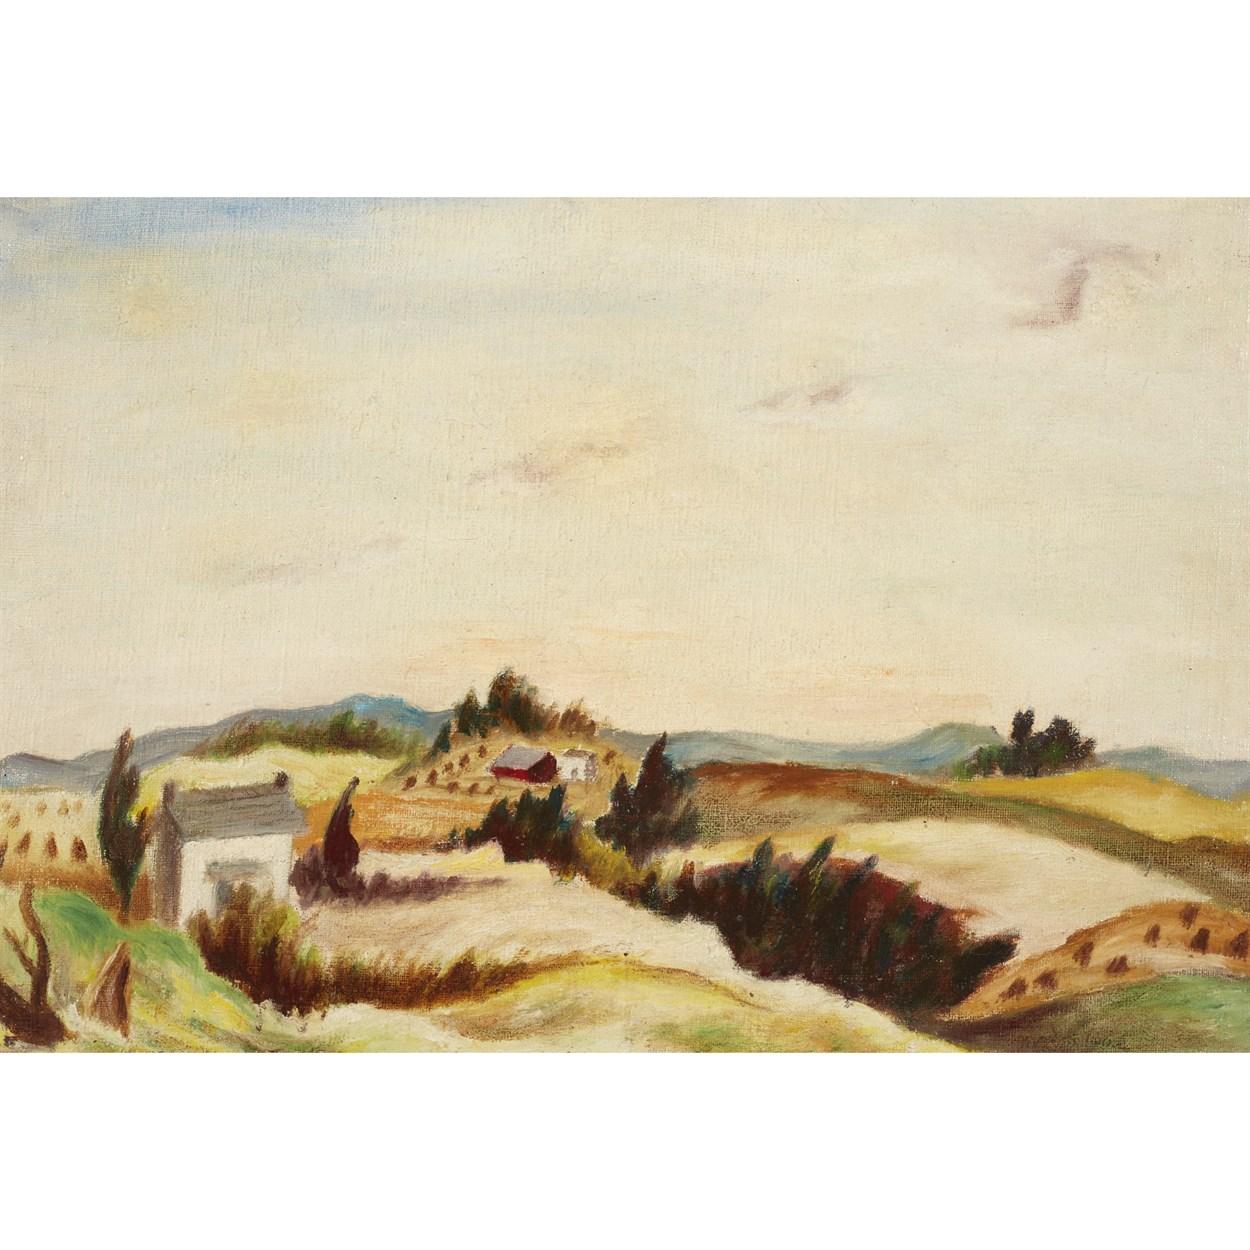 Lot 14 - Jackson Pollock (American, 1912-1956)